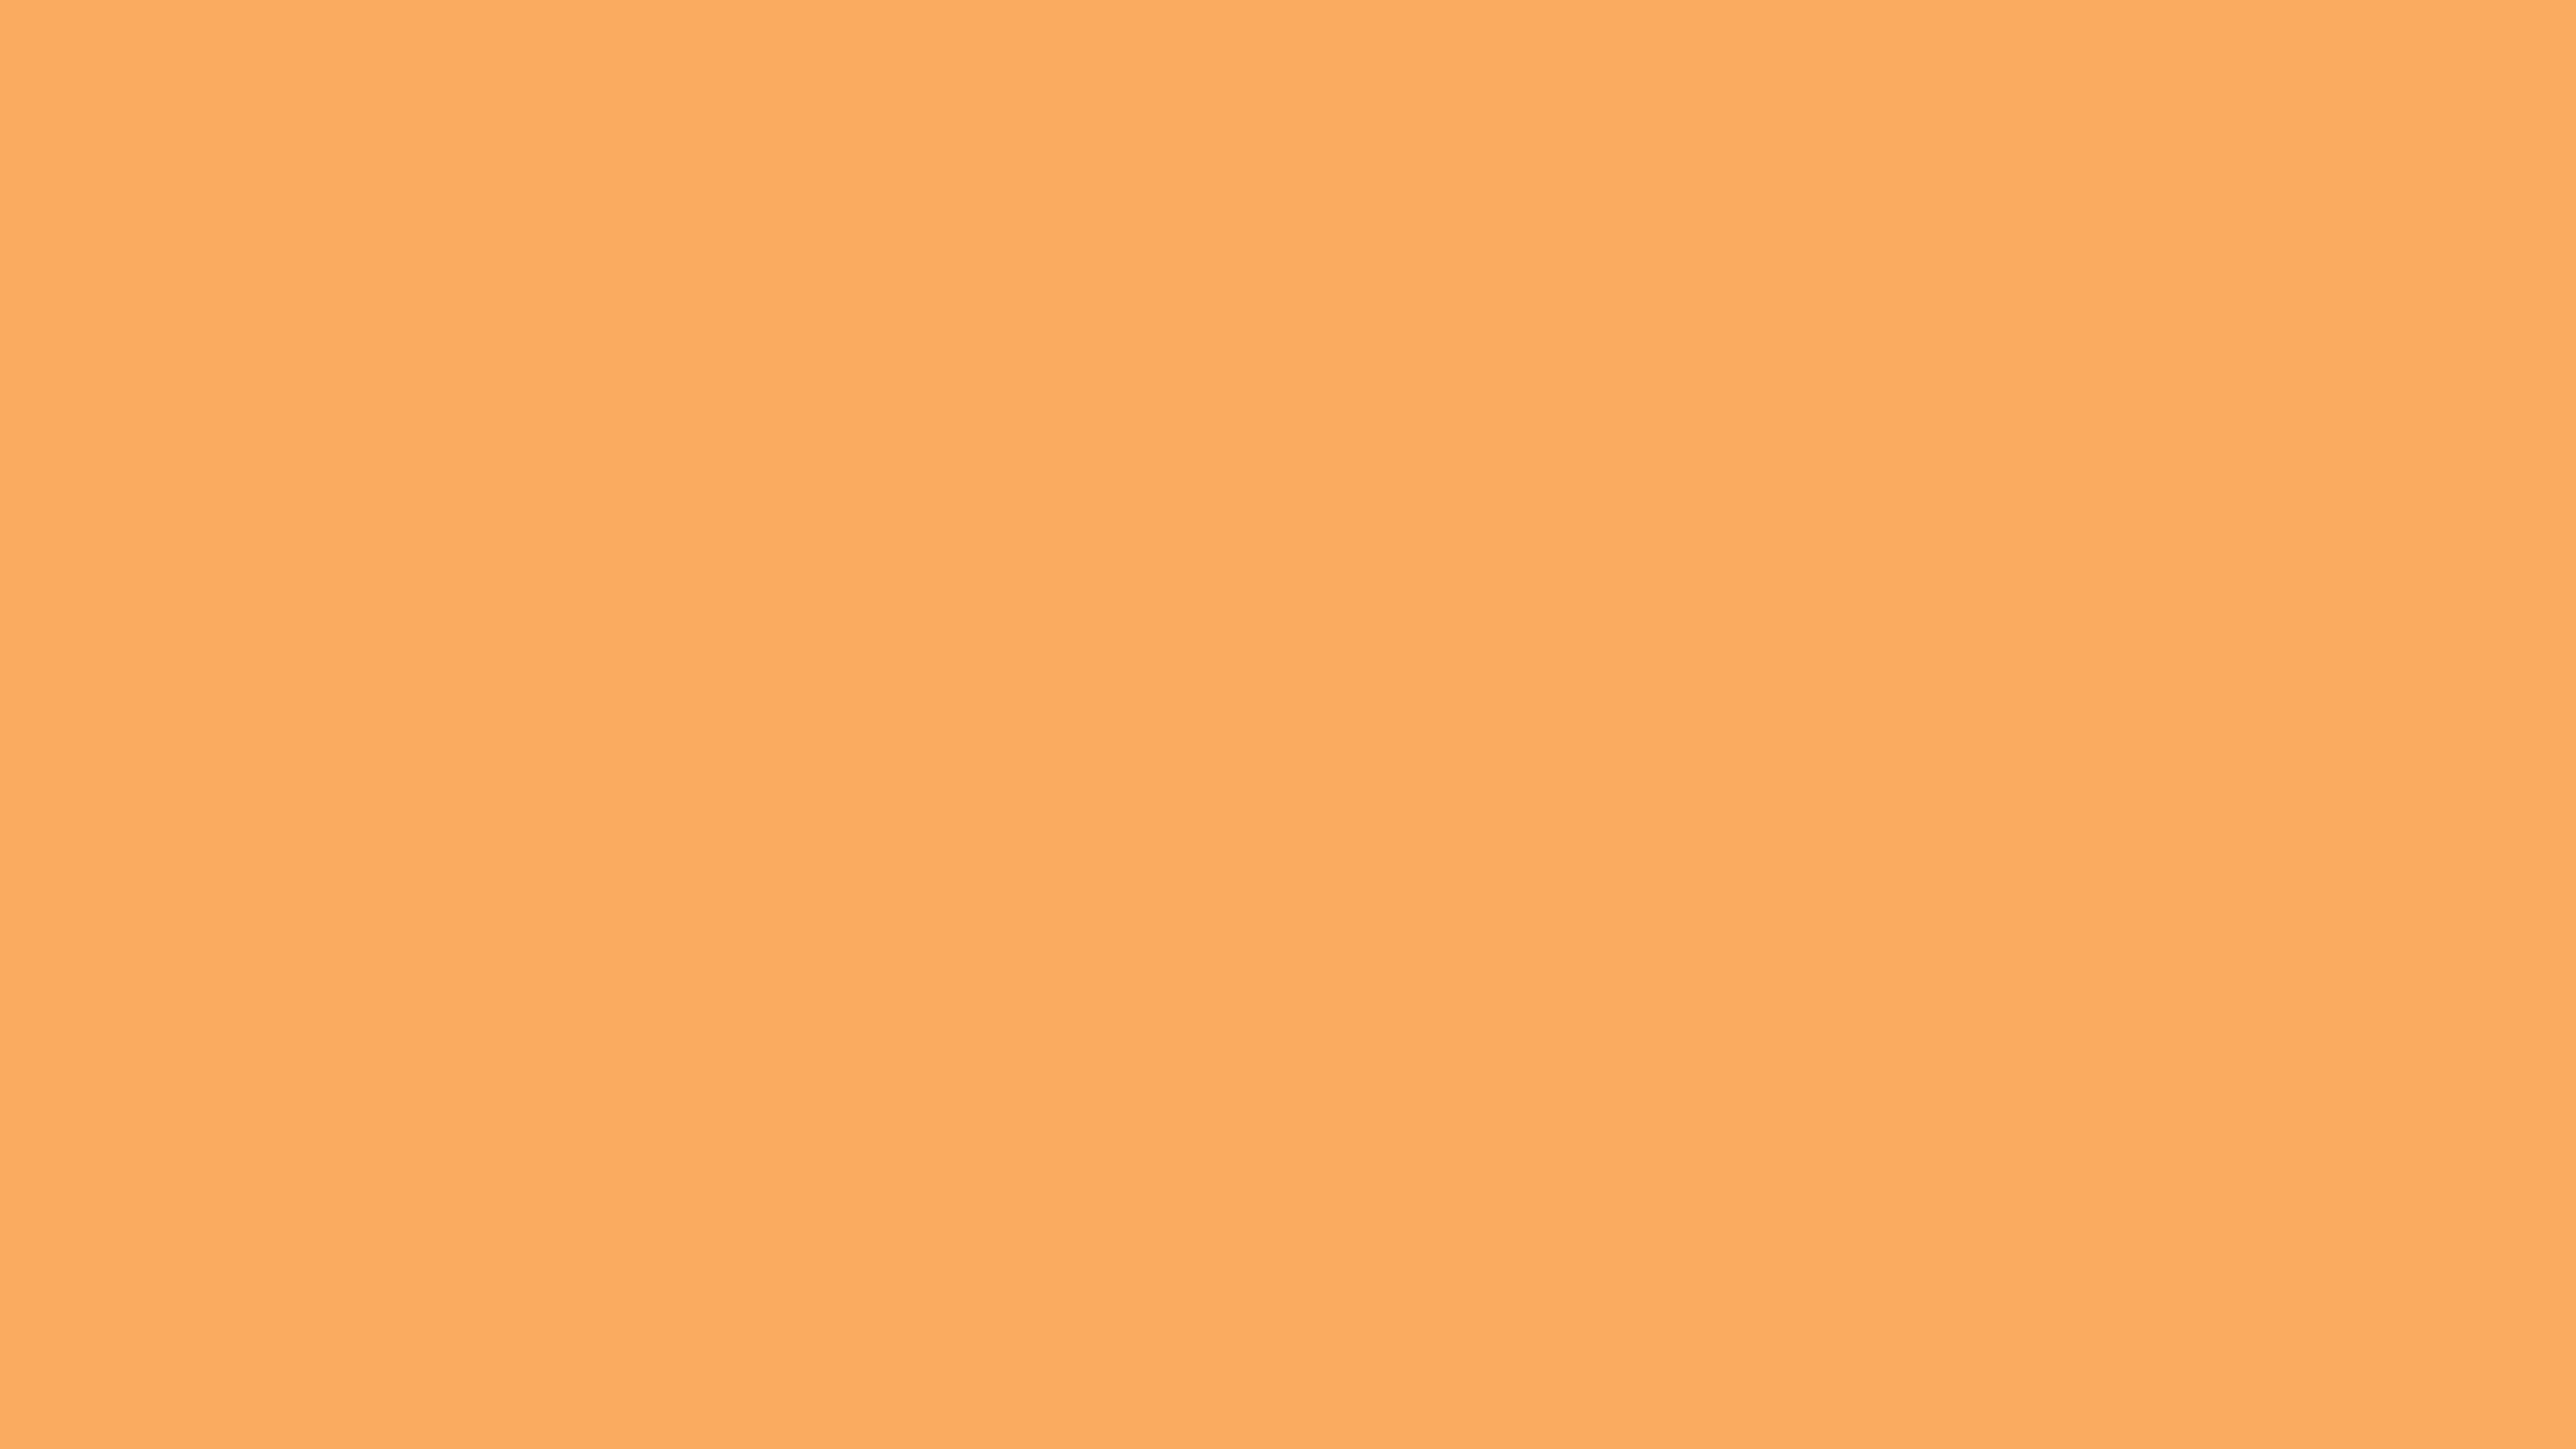 7680x4320 Rajah Solid Color Background